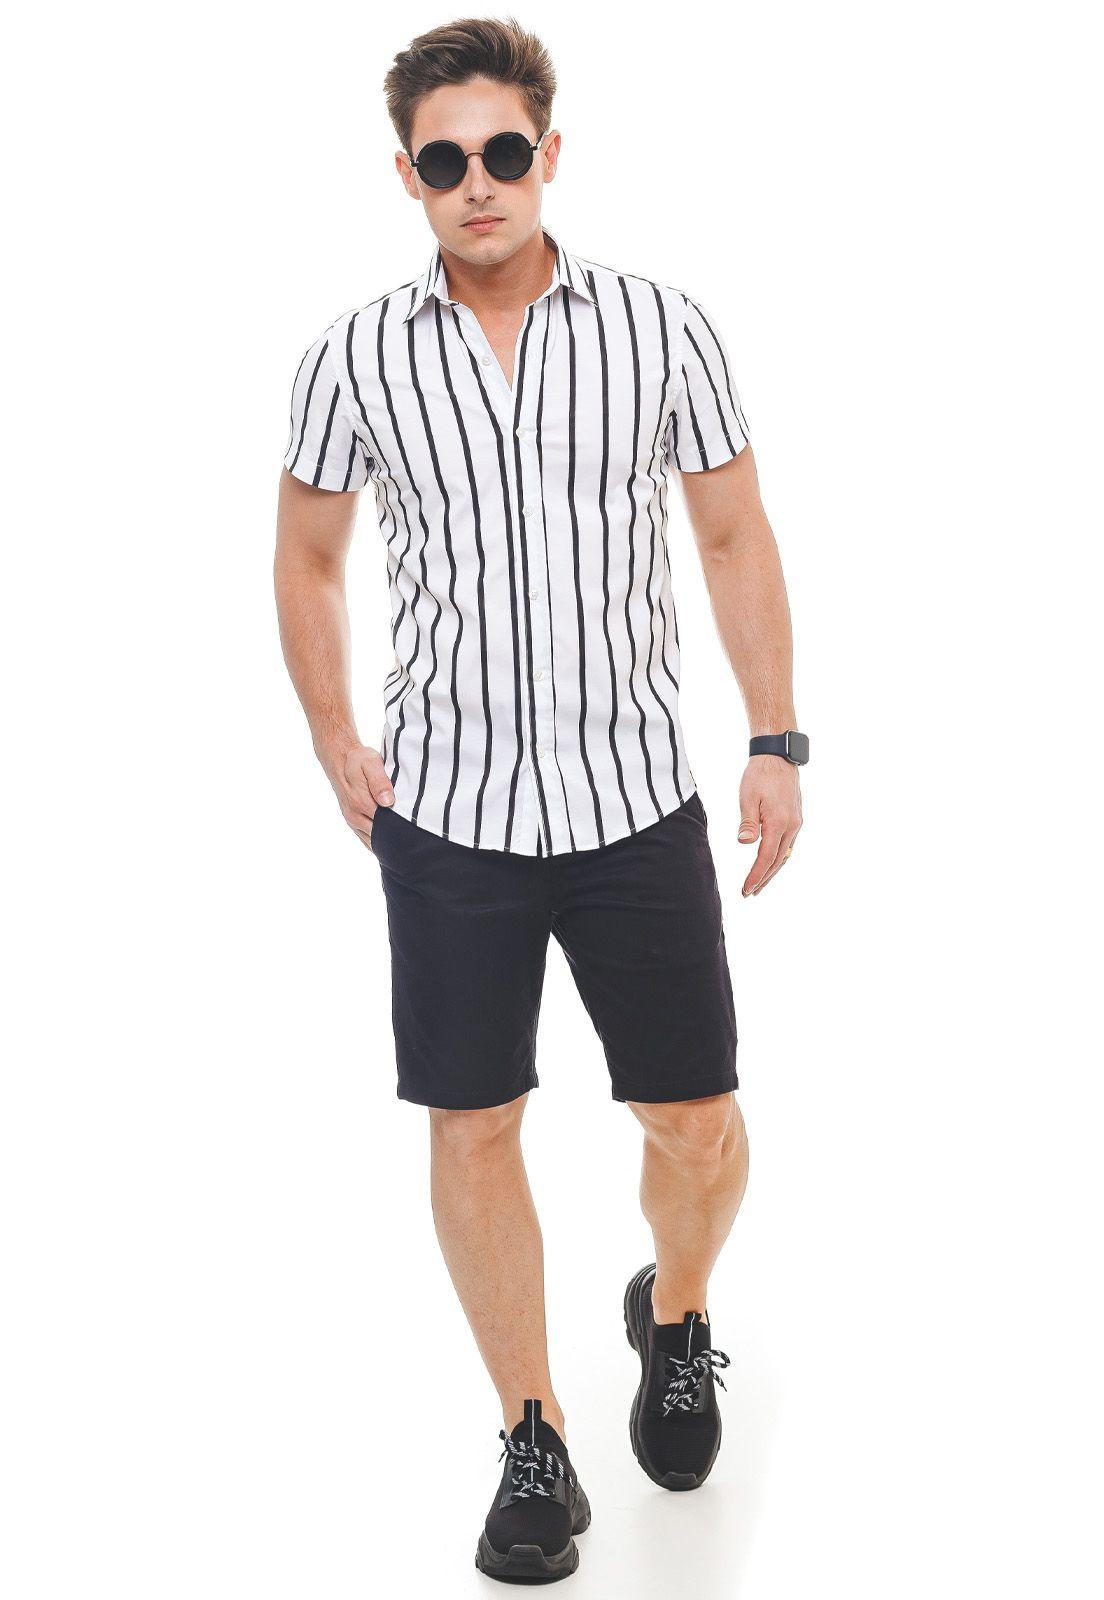 500213 - Camisa Social Manga Curta Masculina Slim Listrada